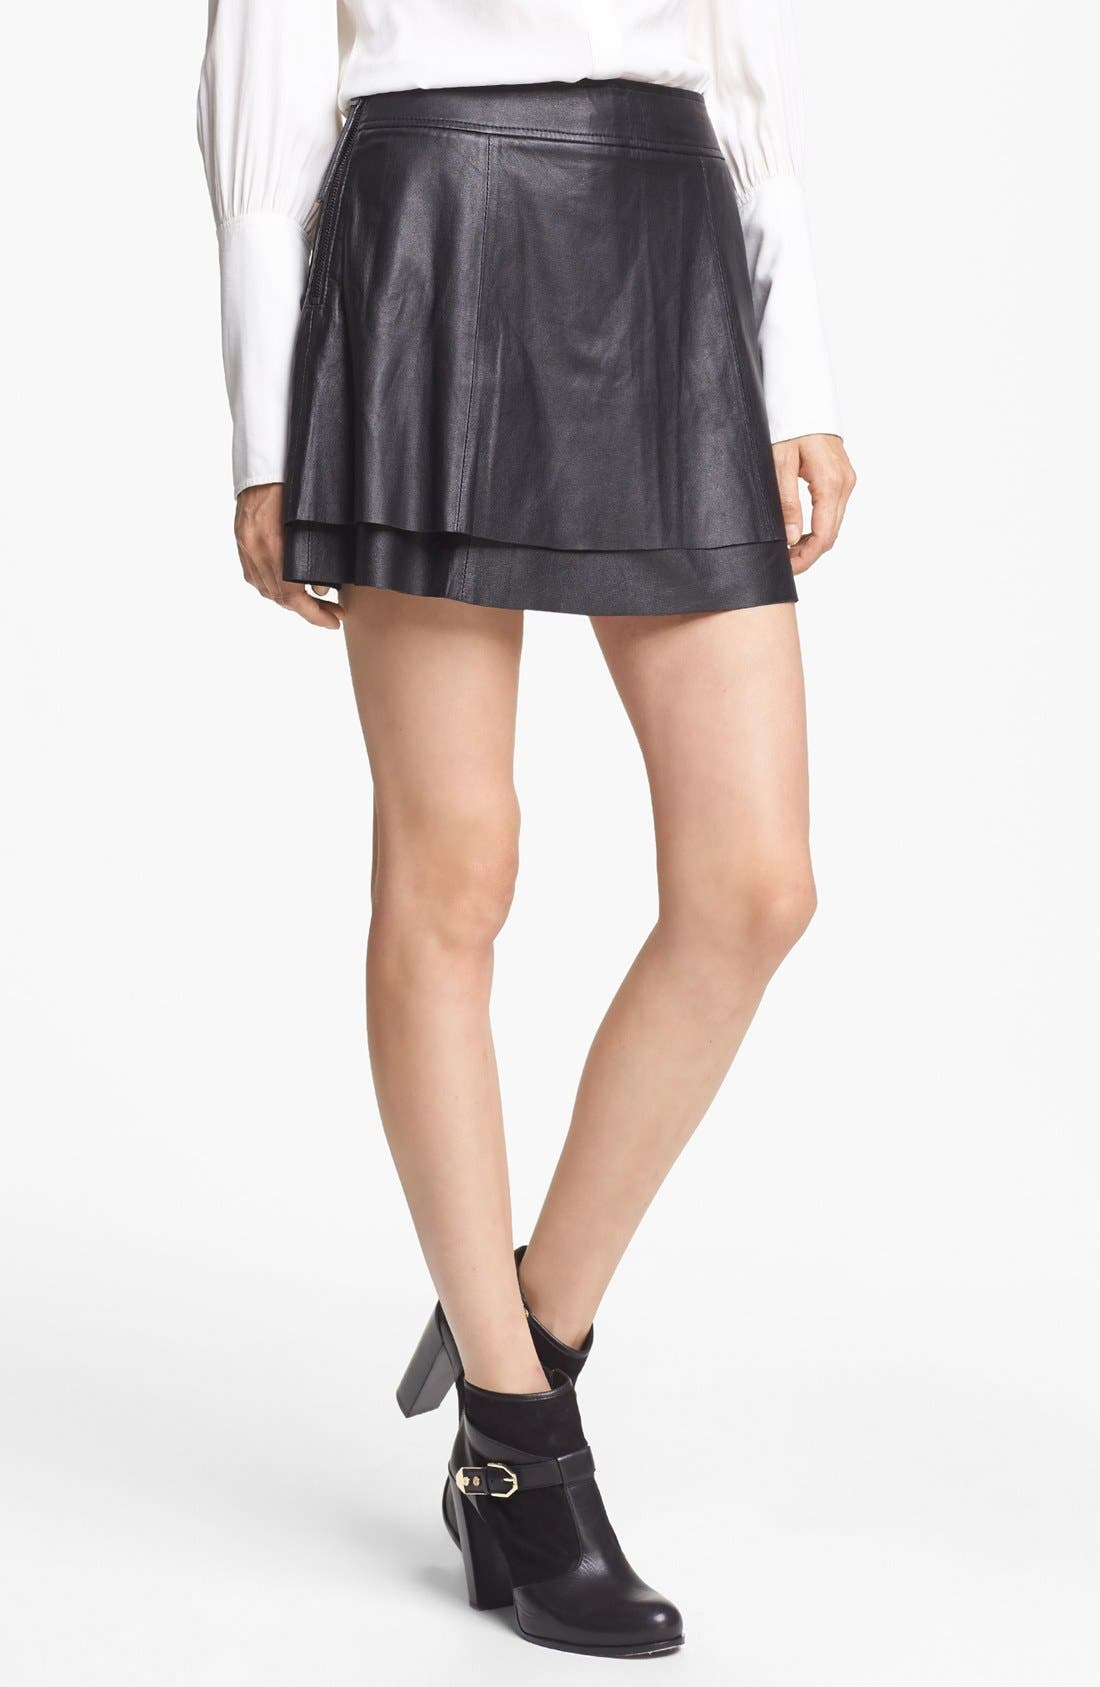 Alternate Image 1 Selected - Rachel Zoe 'Venice' Lambskin Leather Miniskirt